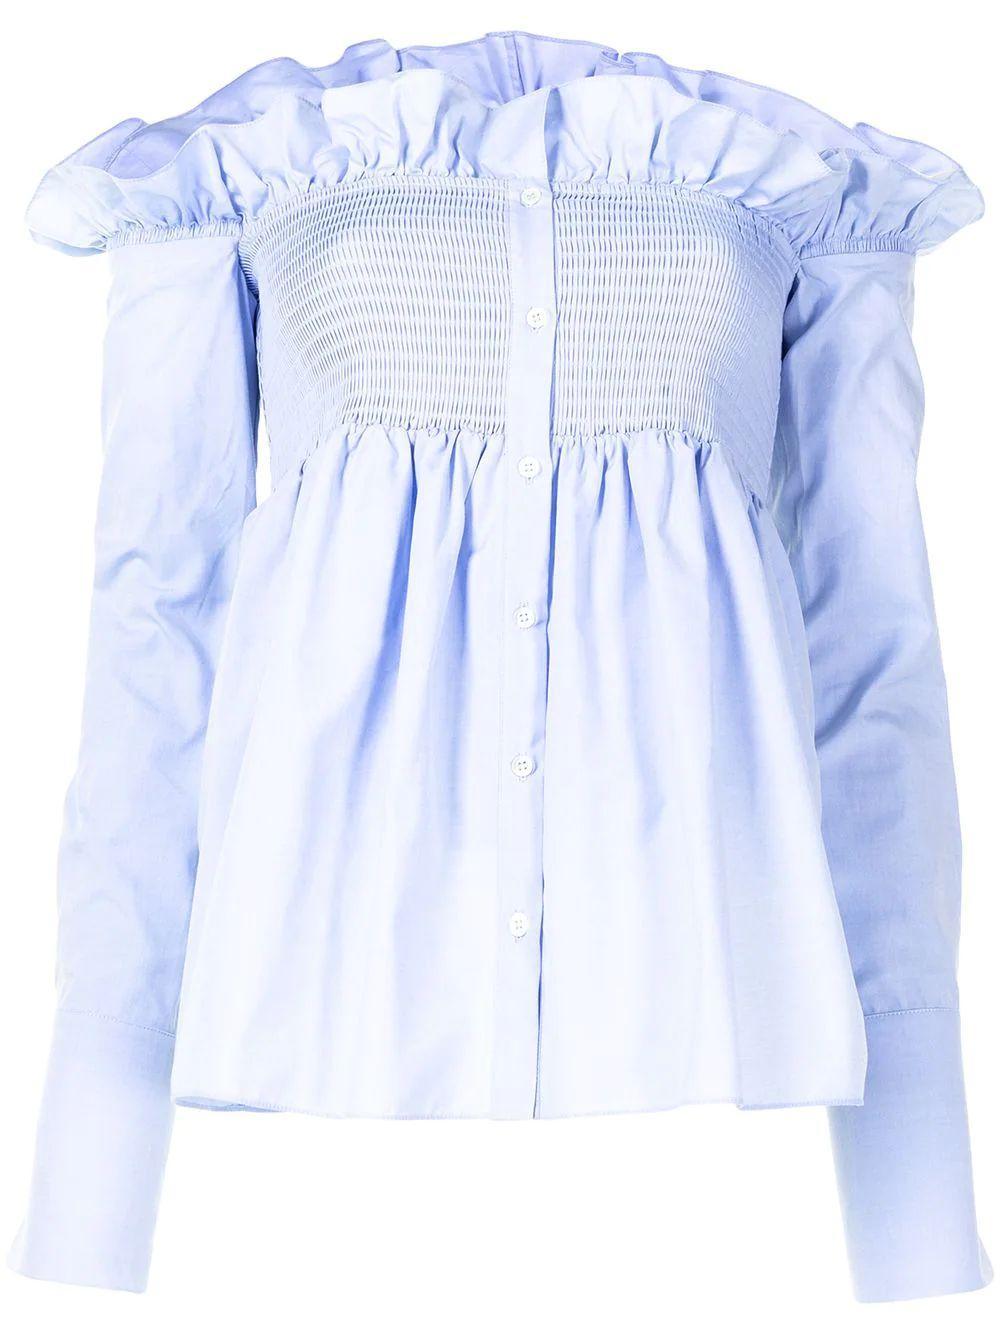 Smocked Off The Shoulder Oxford Shirt Item # 2221WSH002579A